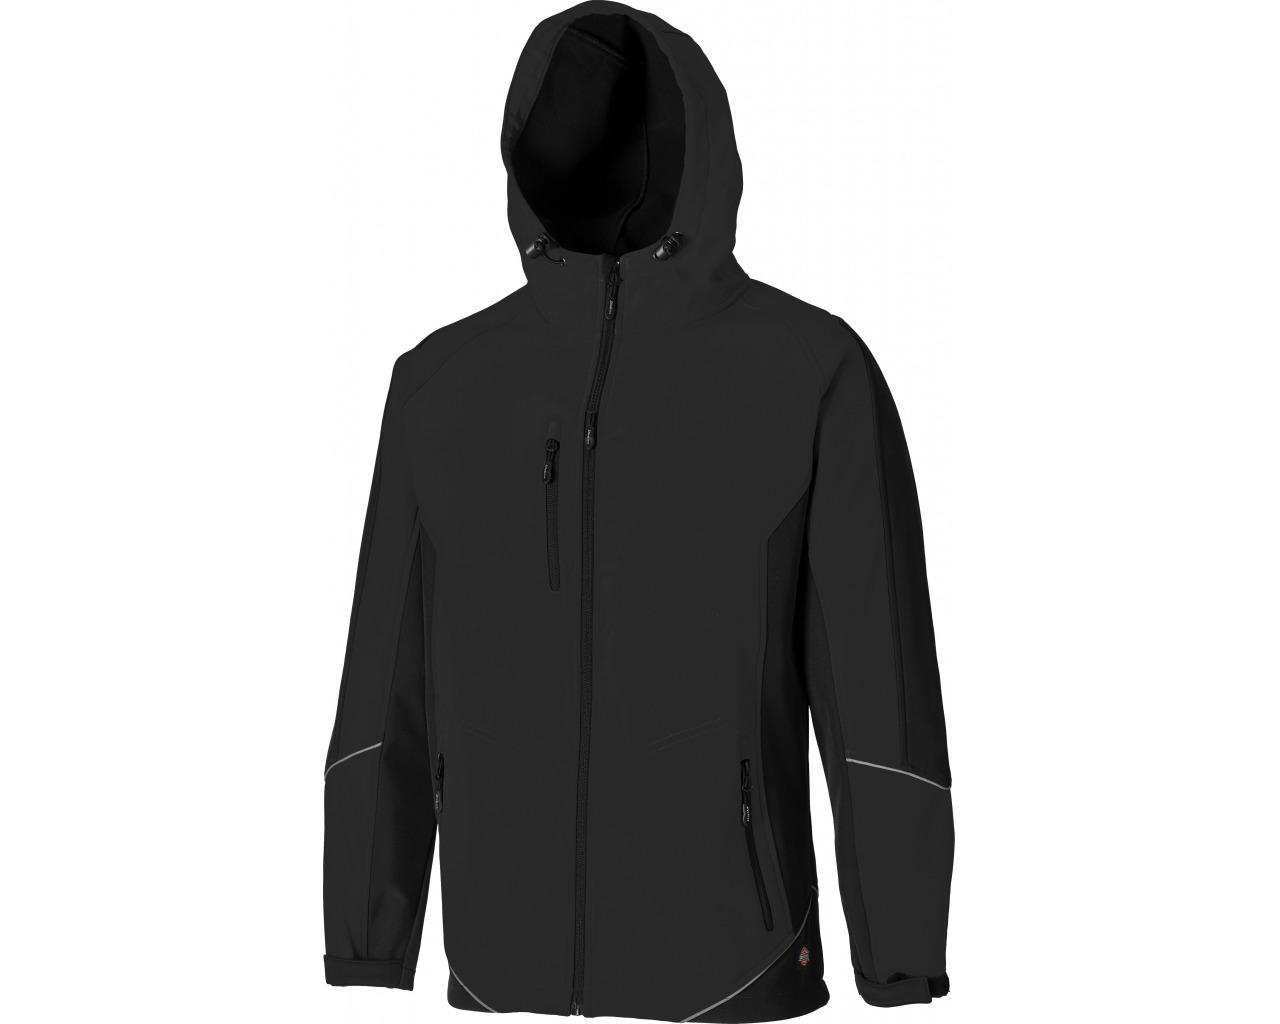 Dickies Two Tone Black Soft Shell Jacket 1